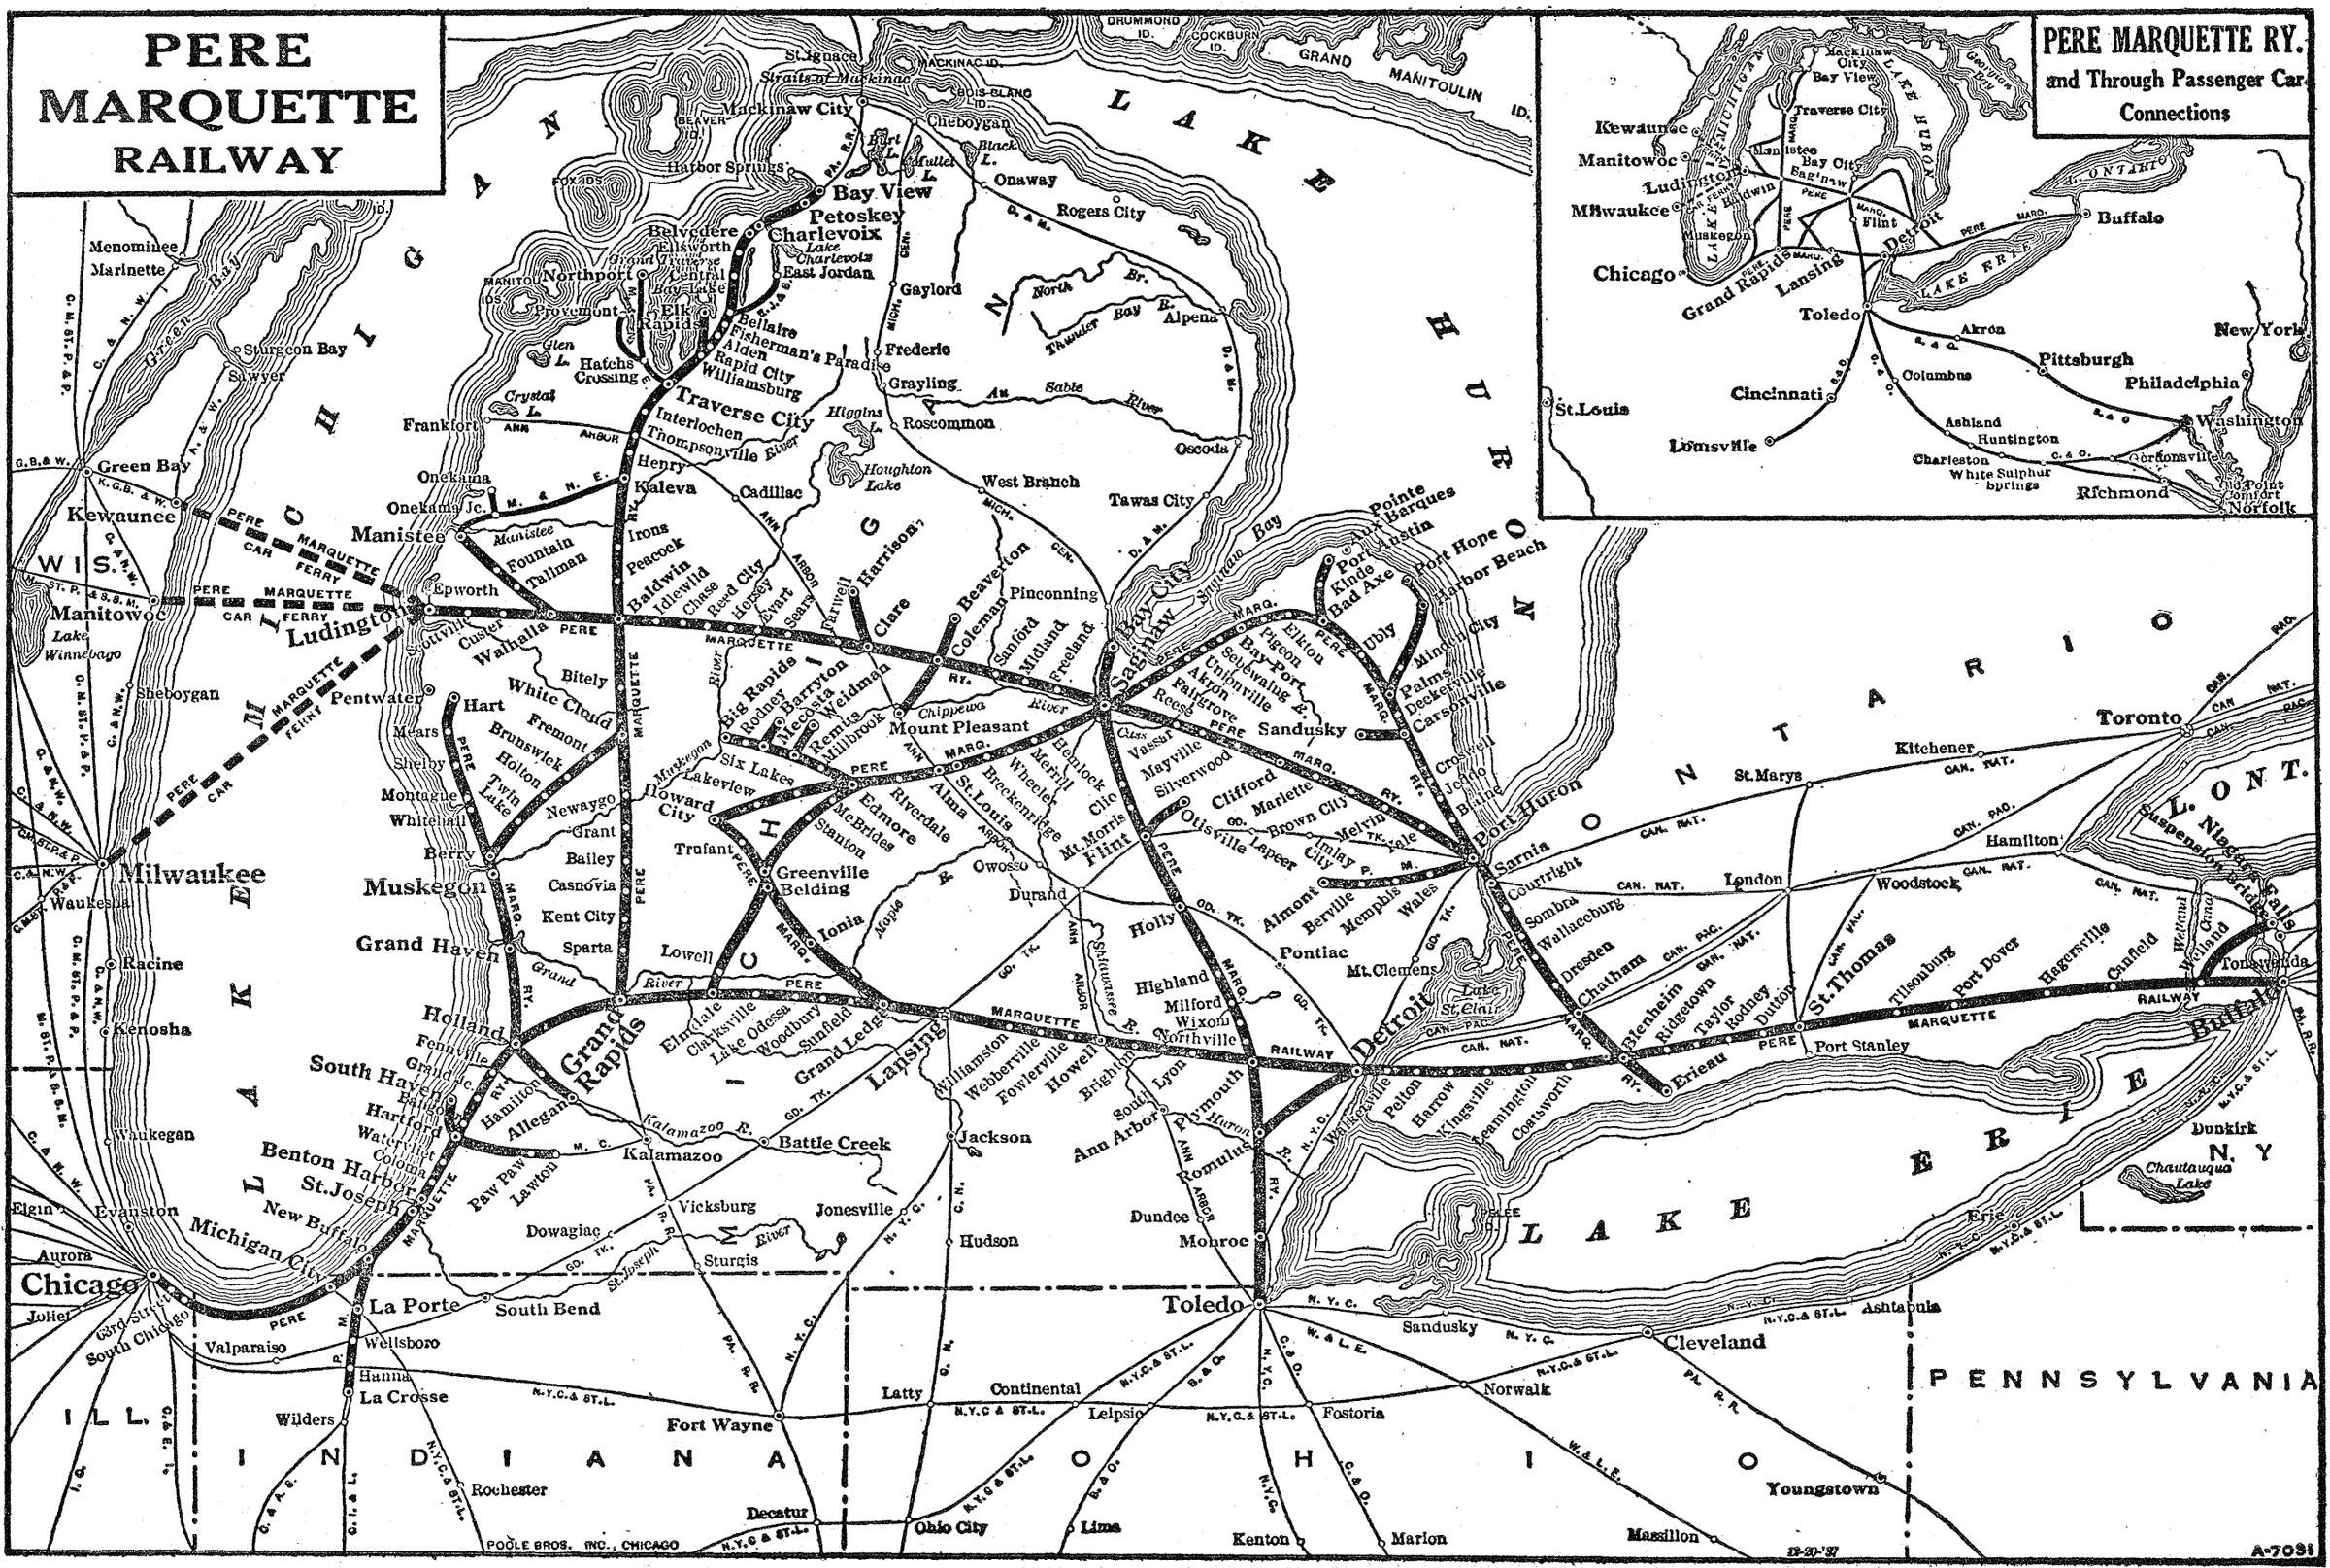 The Pere Marquette Railway - Map of us railroads in 1900